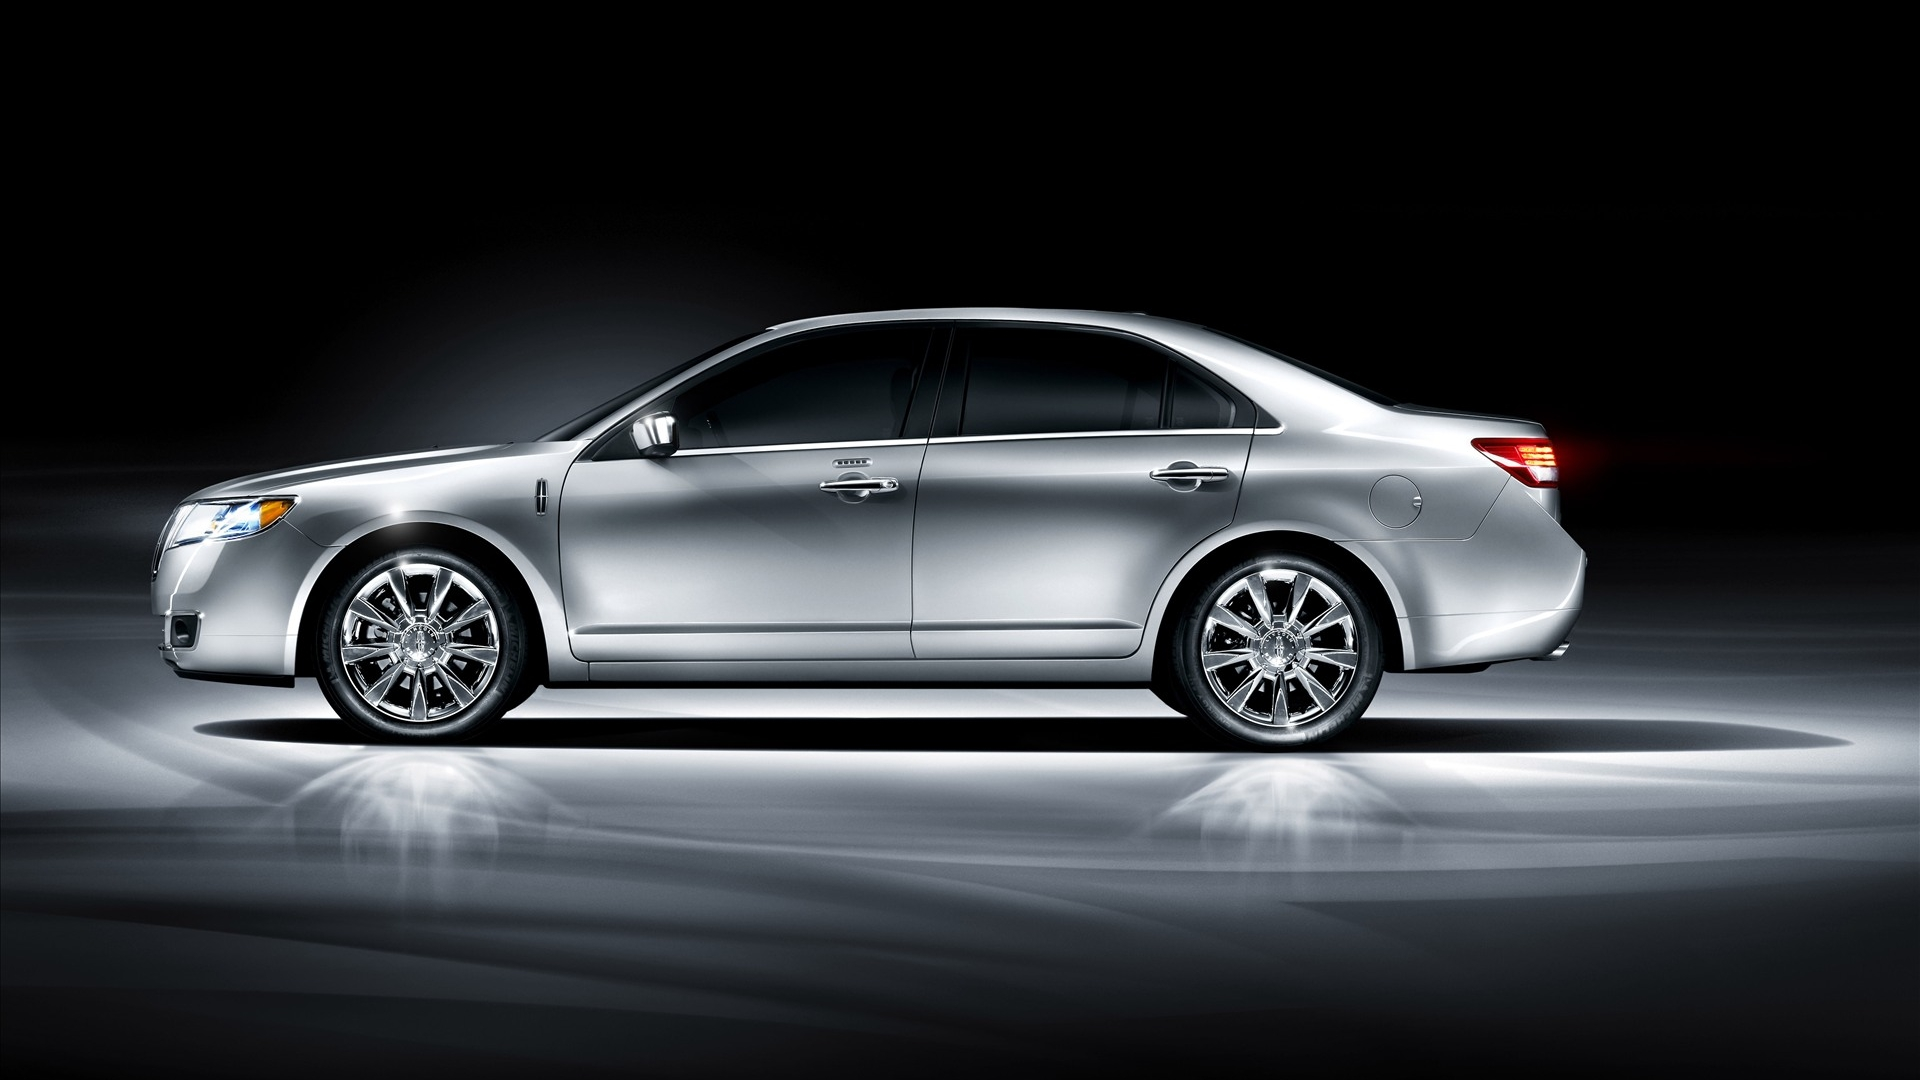 Download 'luxury car wallpaper' HD wallpaper